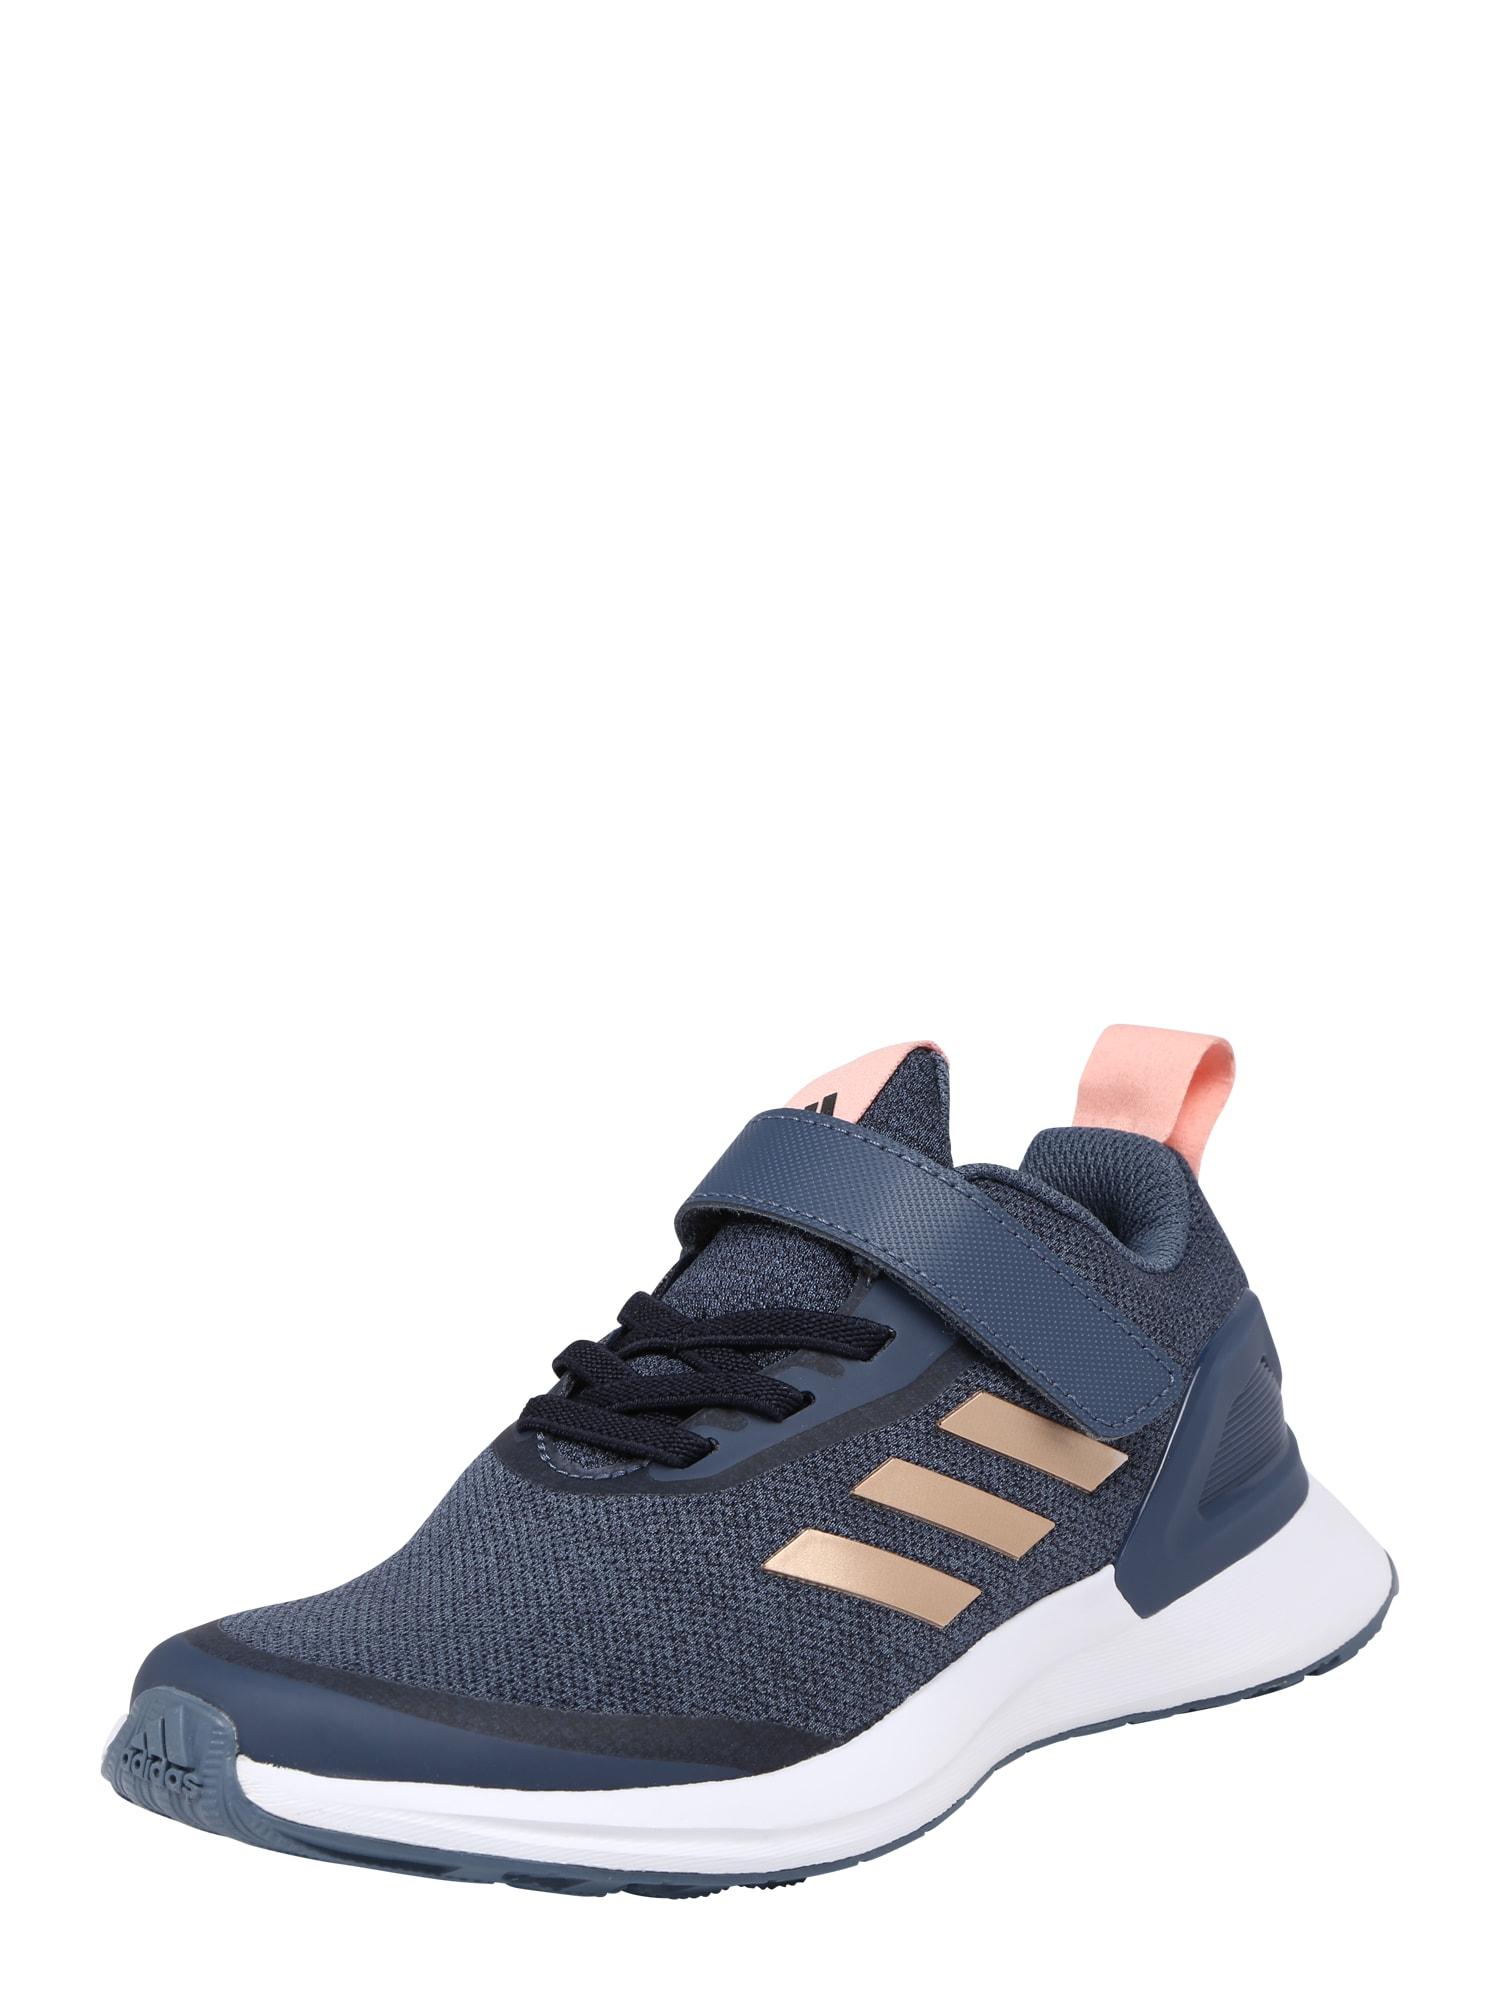 Sportovní boty RapidaRun X EL C modrá růžová bílá ADIDAS PERFORMANCE